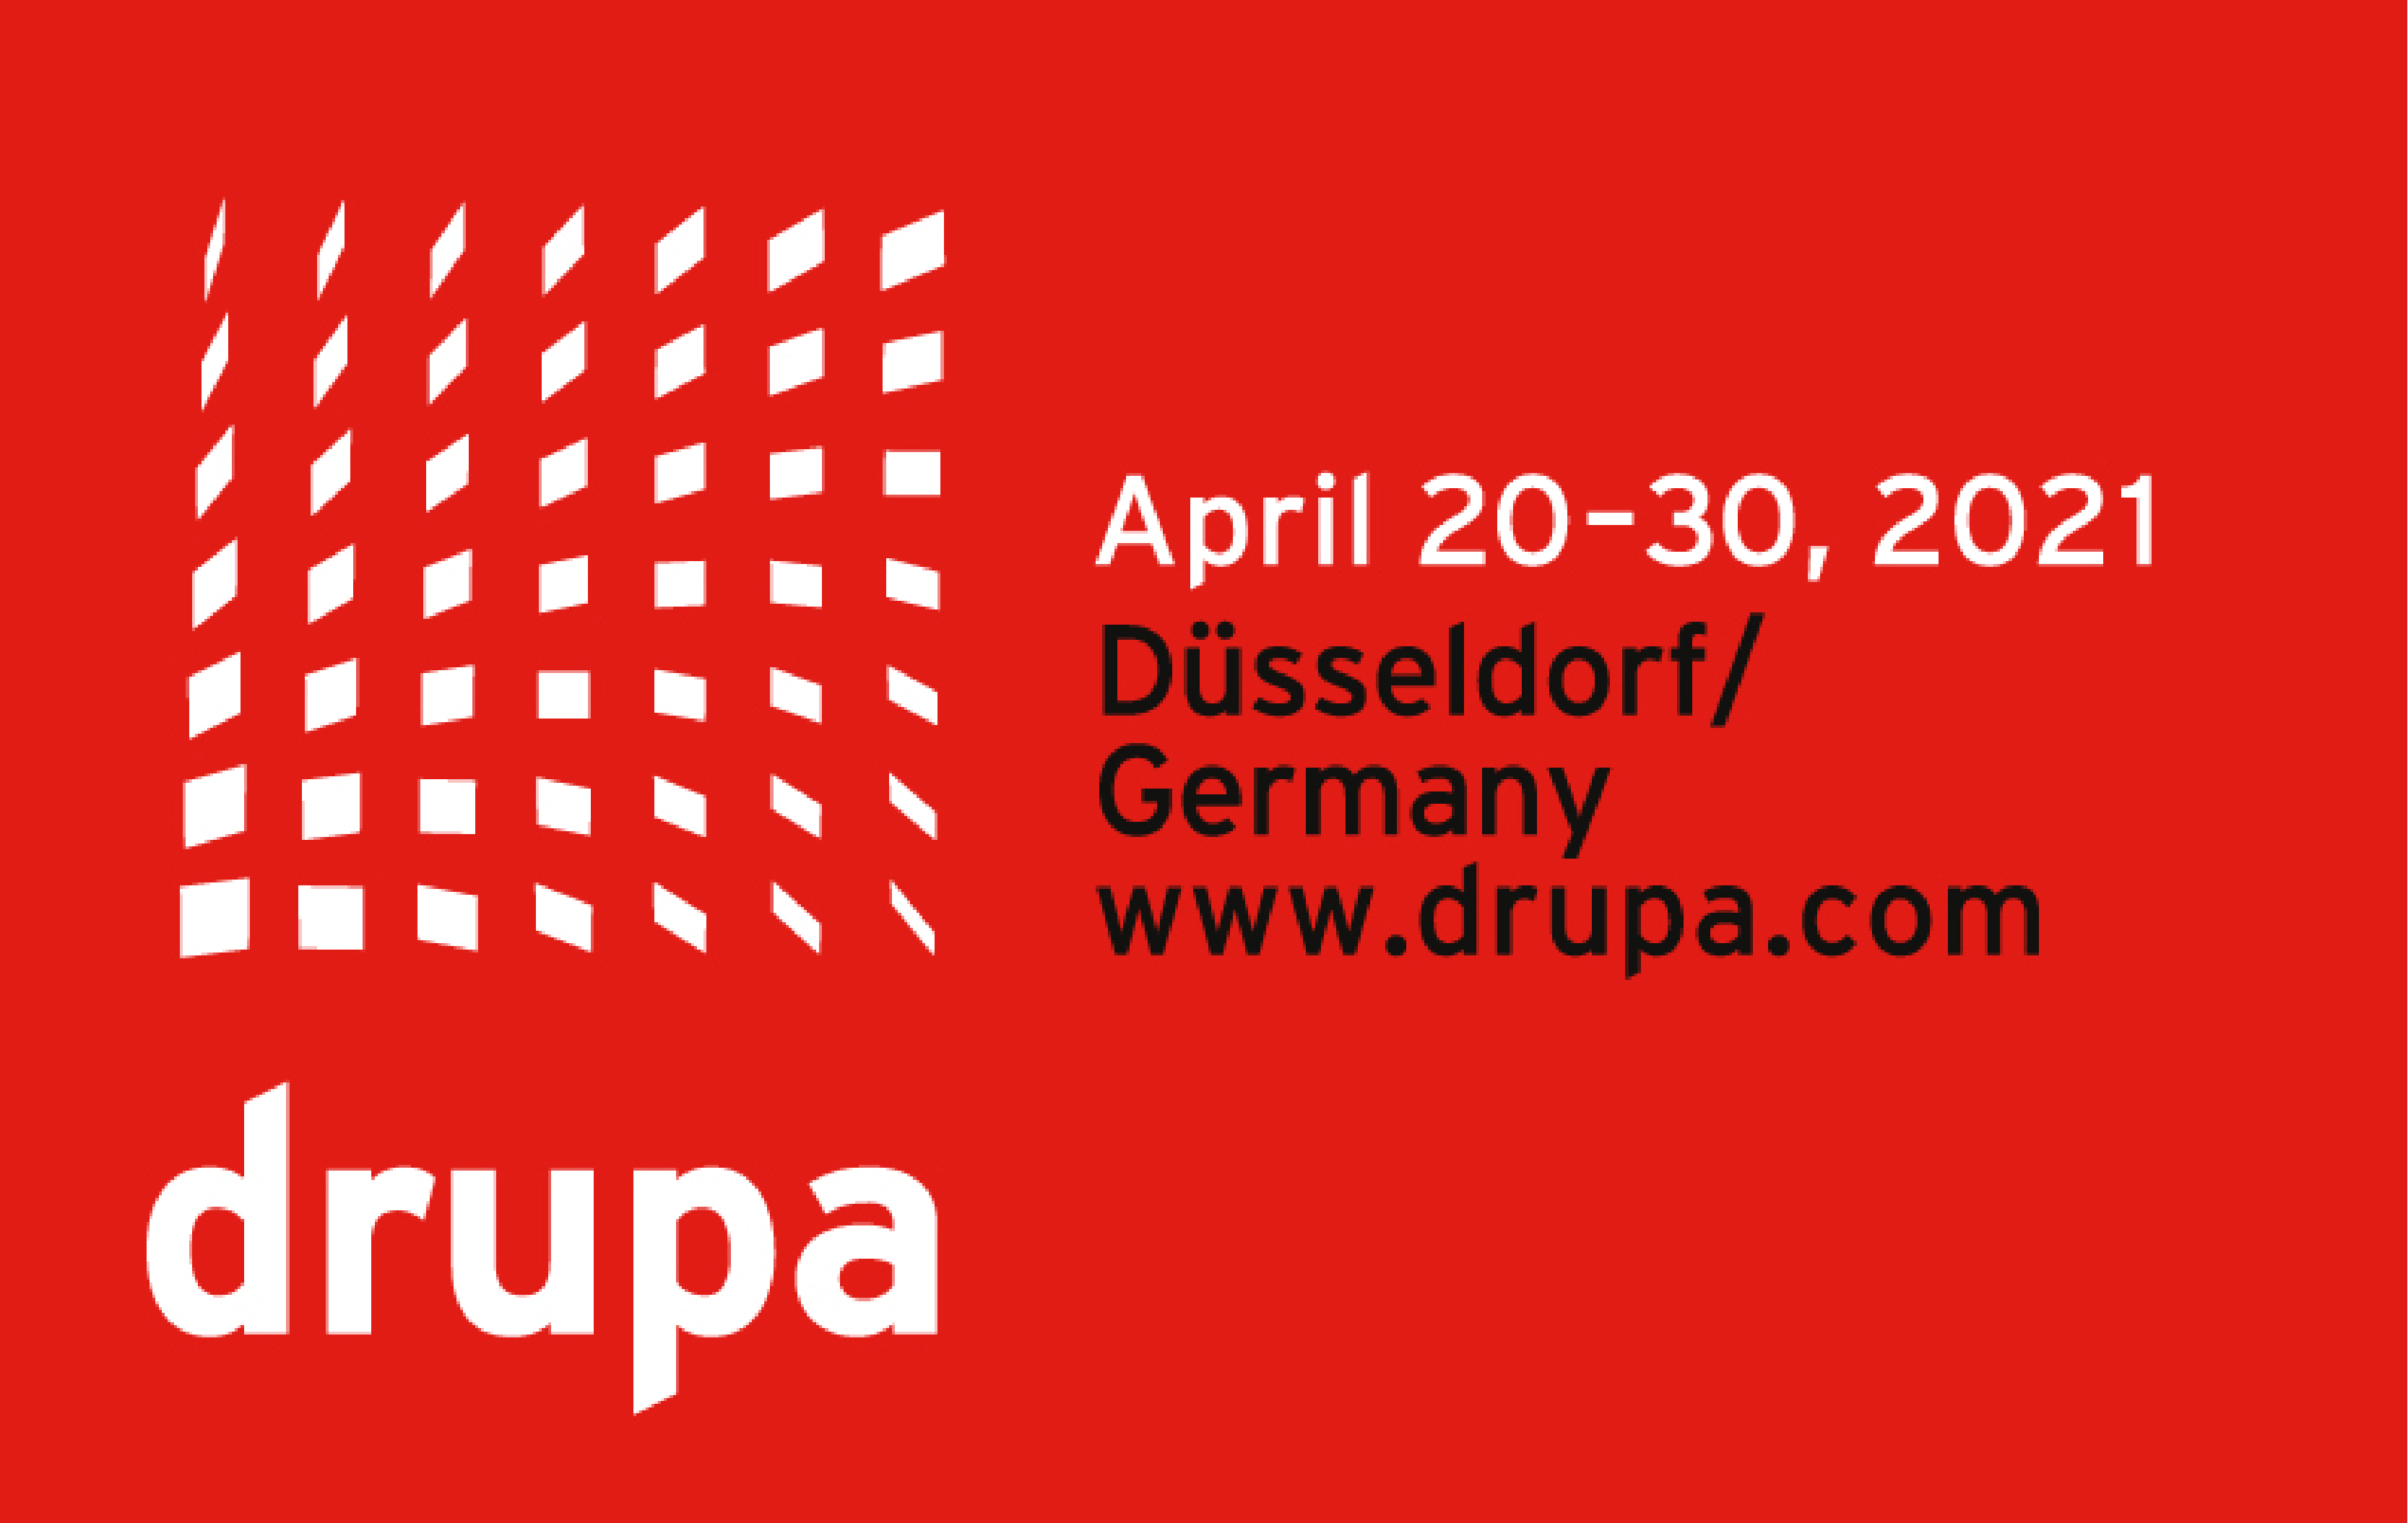 Drupa, 20 – 30 April 2021